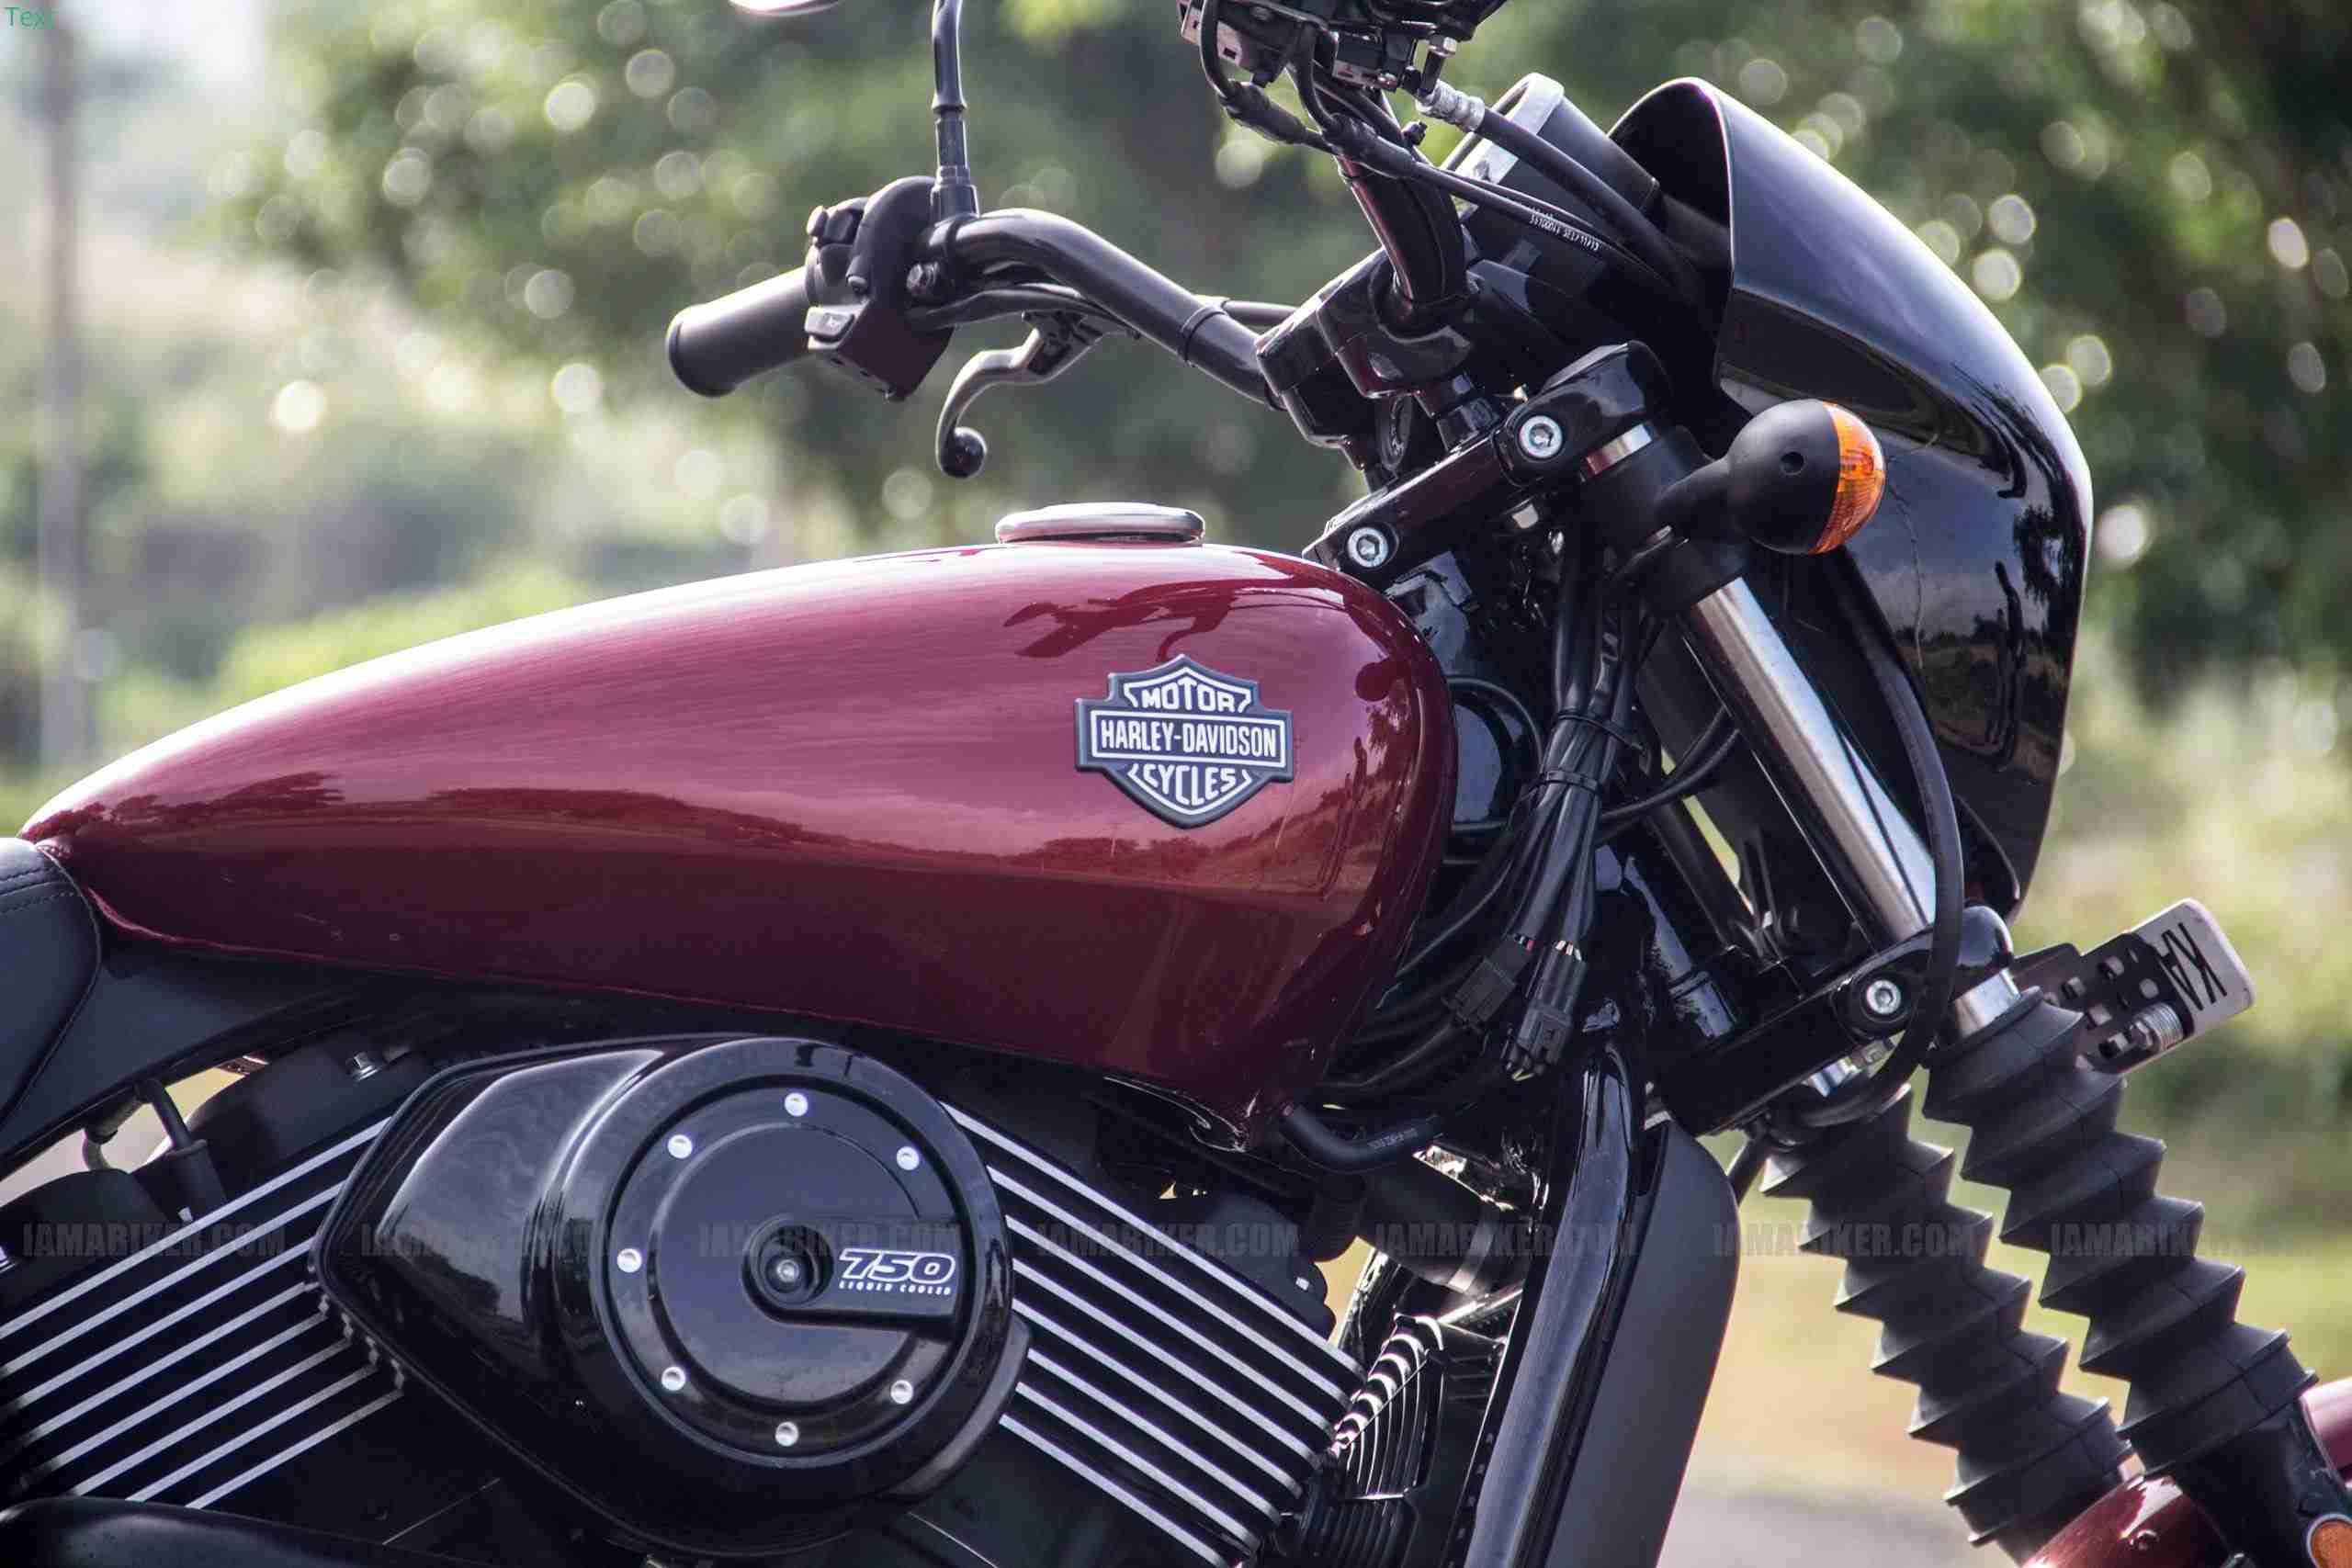 2015 Harley Davidson Street 750 review - 17